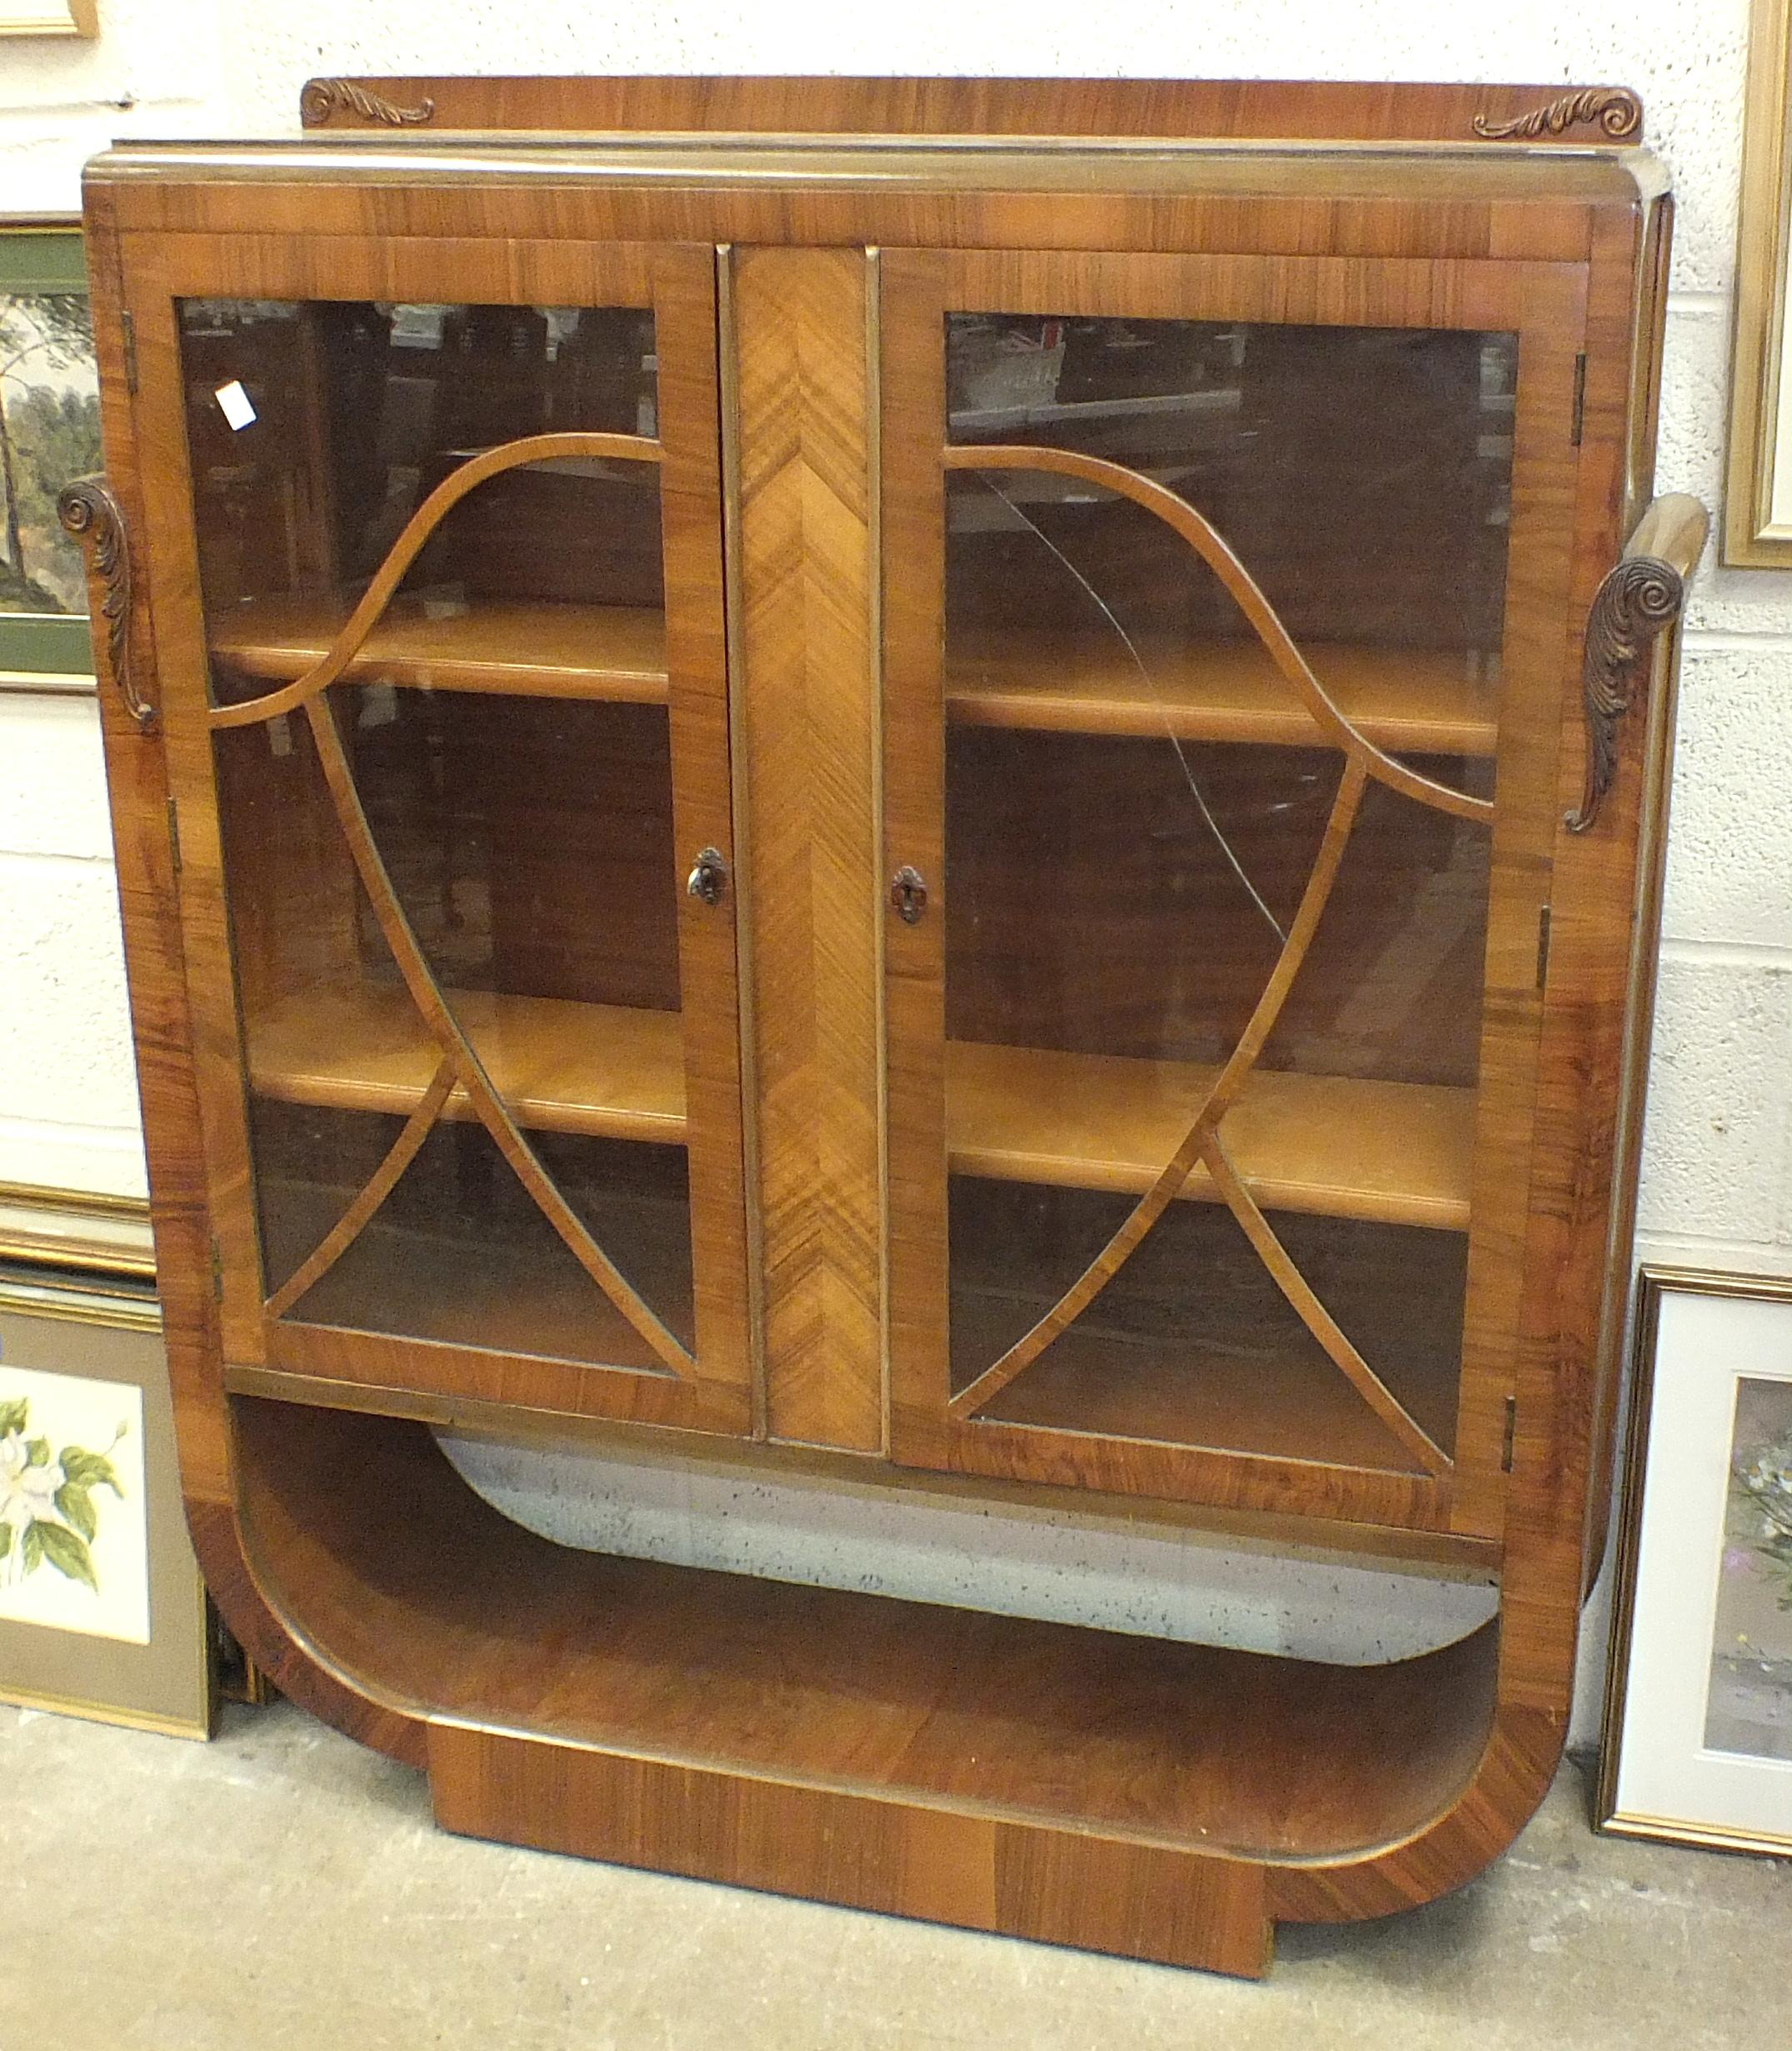 Lot 17 - A 1930's walnut-veneered display cabinet, 110cm wide, 130cm high.